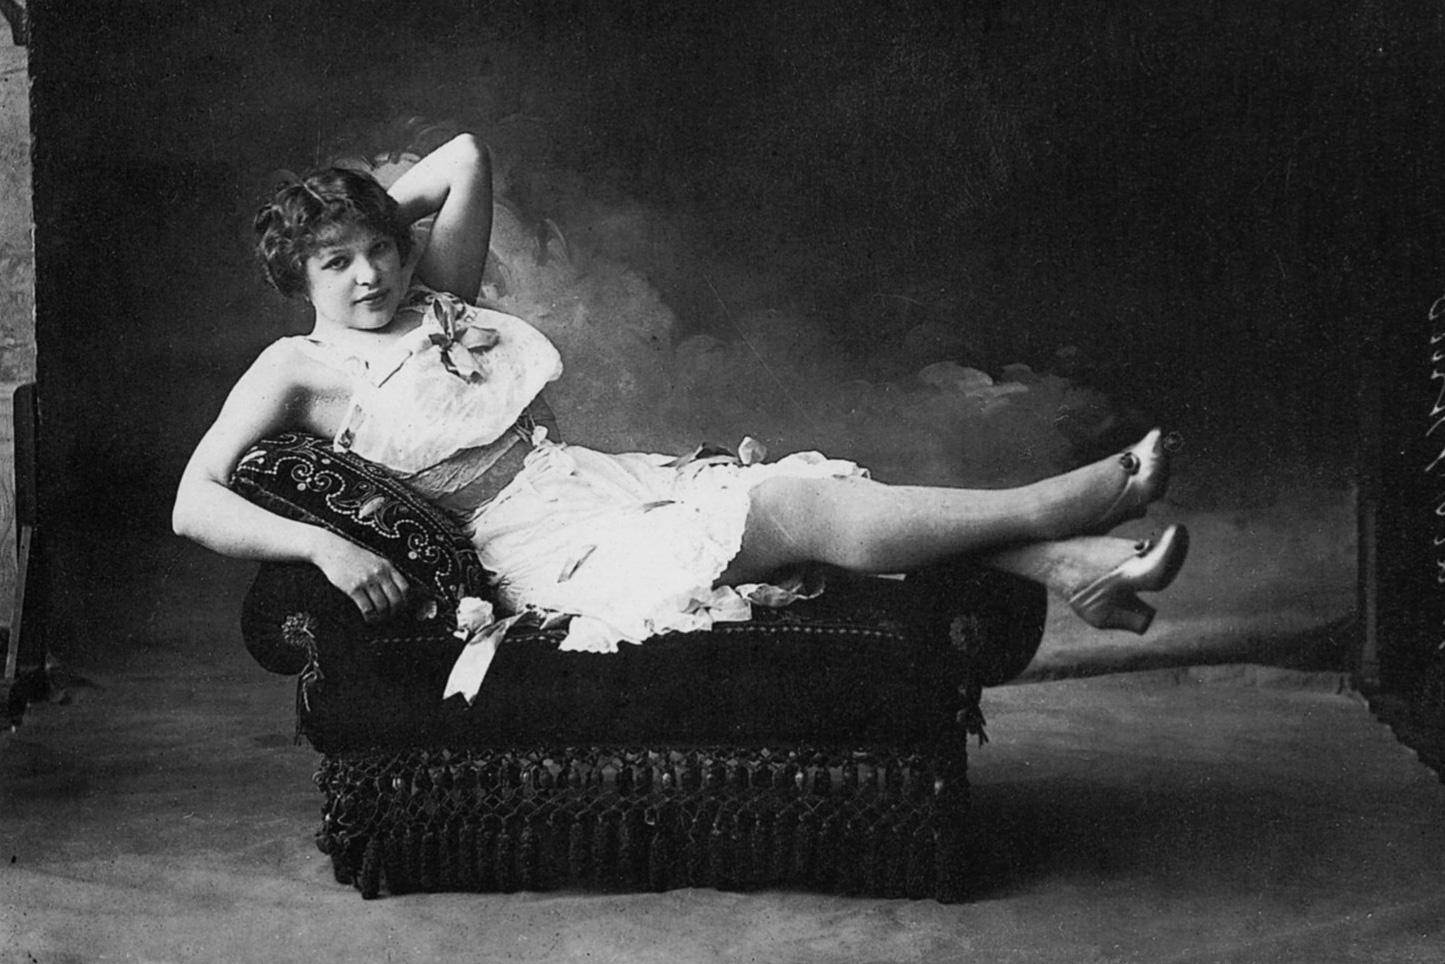 Cabaret singer Maslennikova